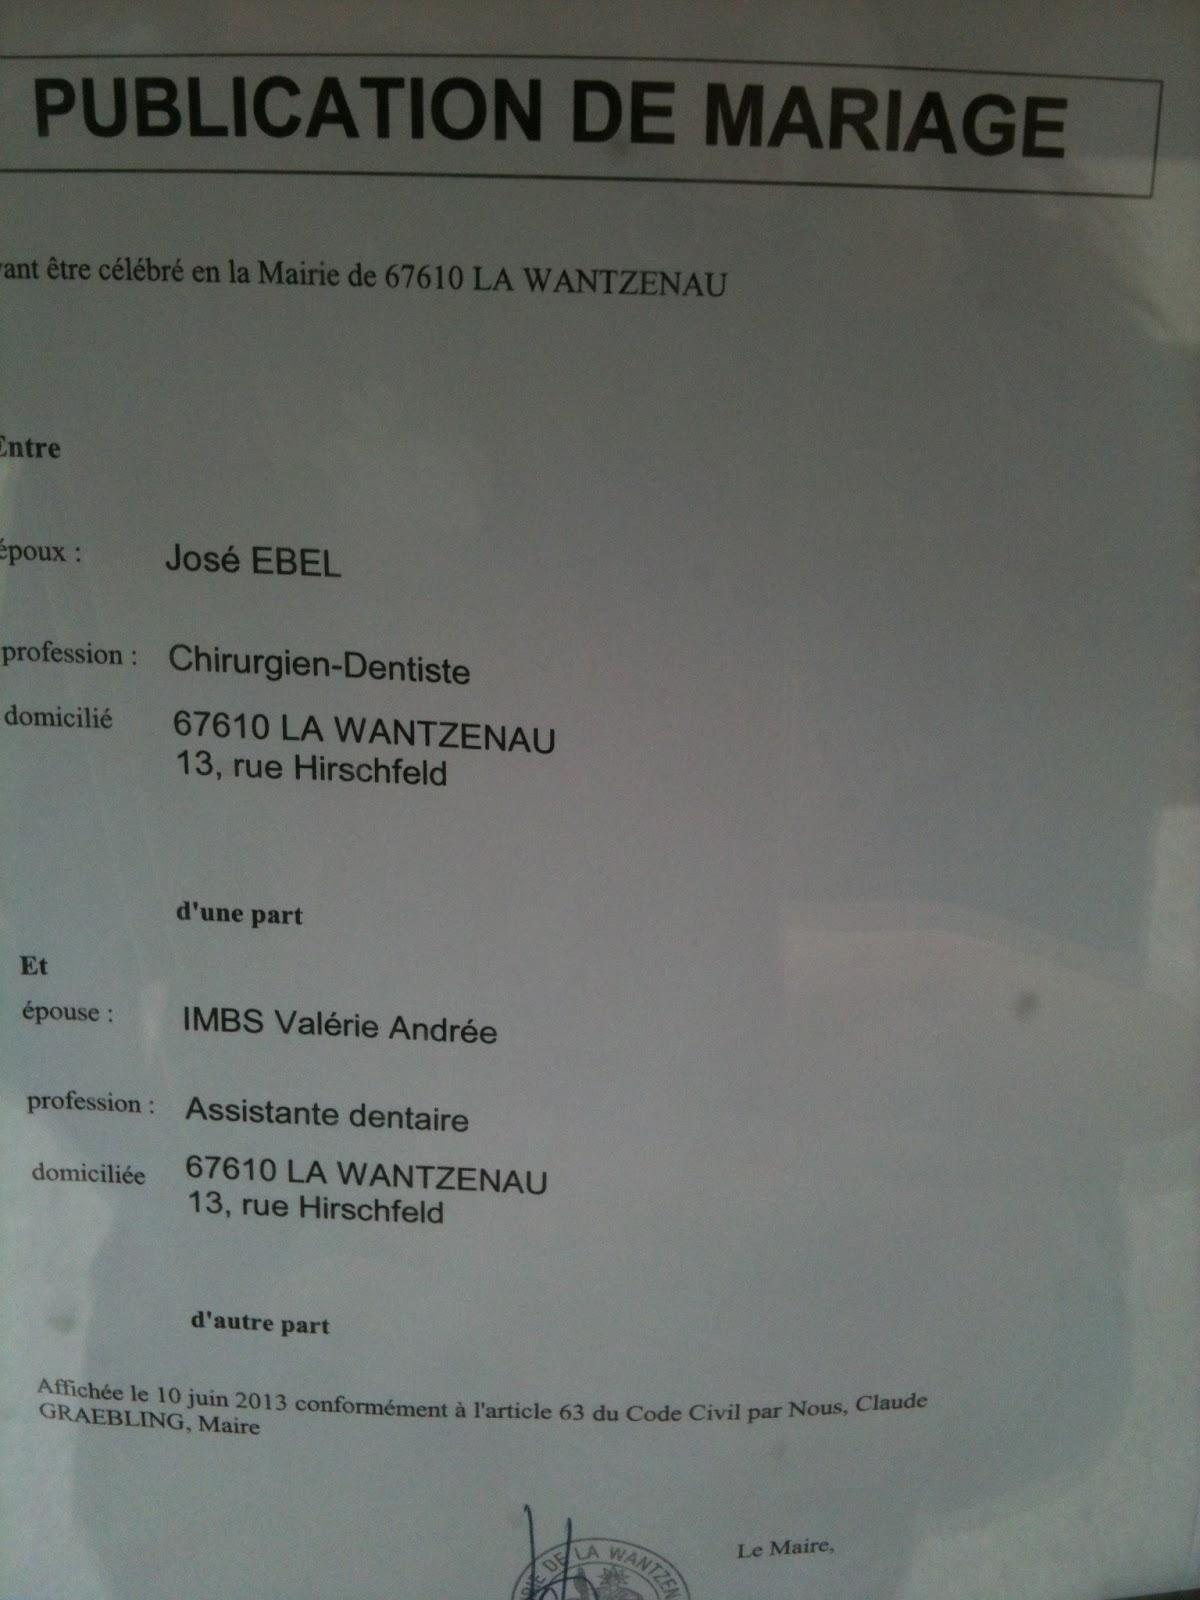 Mariage val jos - Publication banc mariage ...